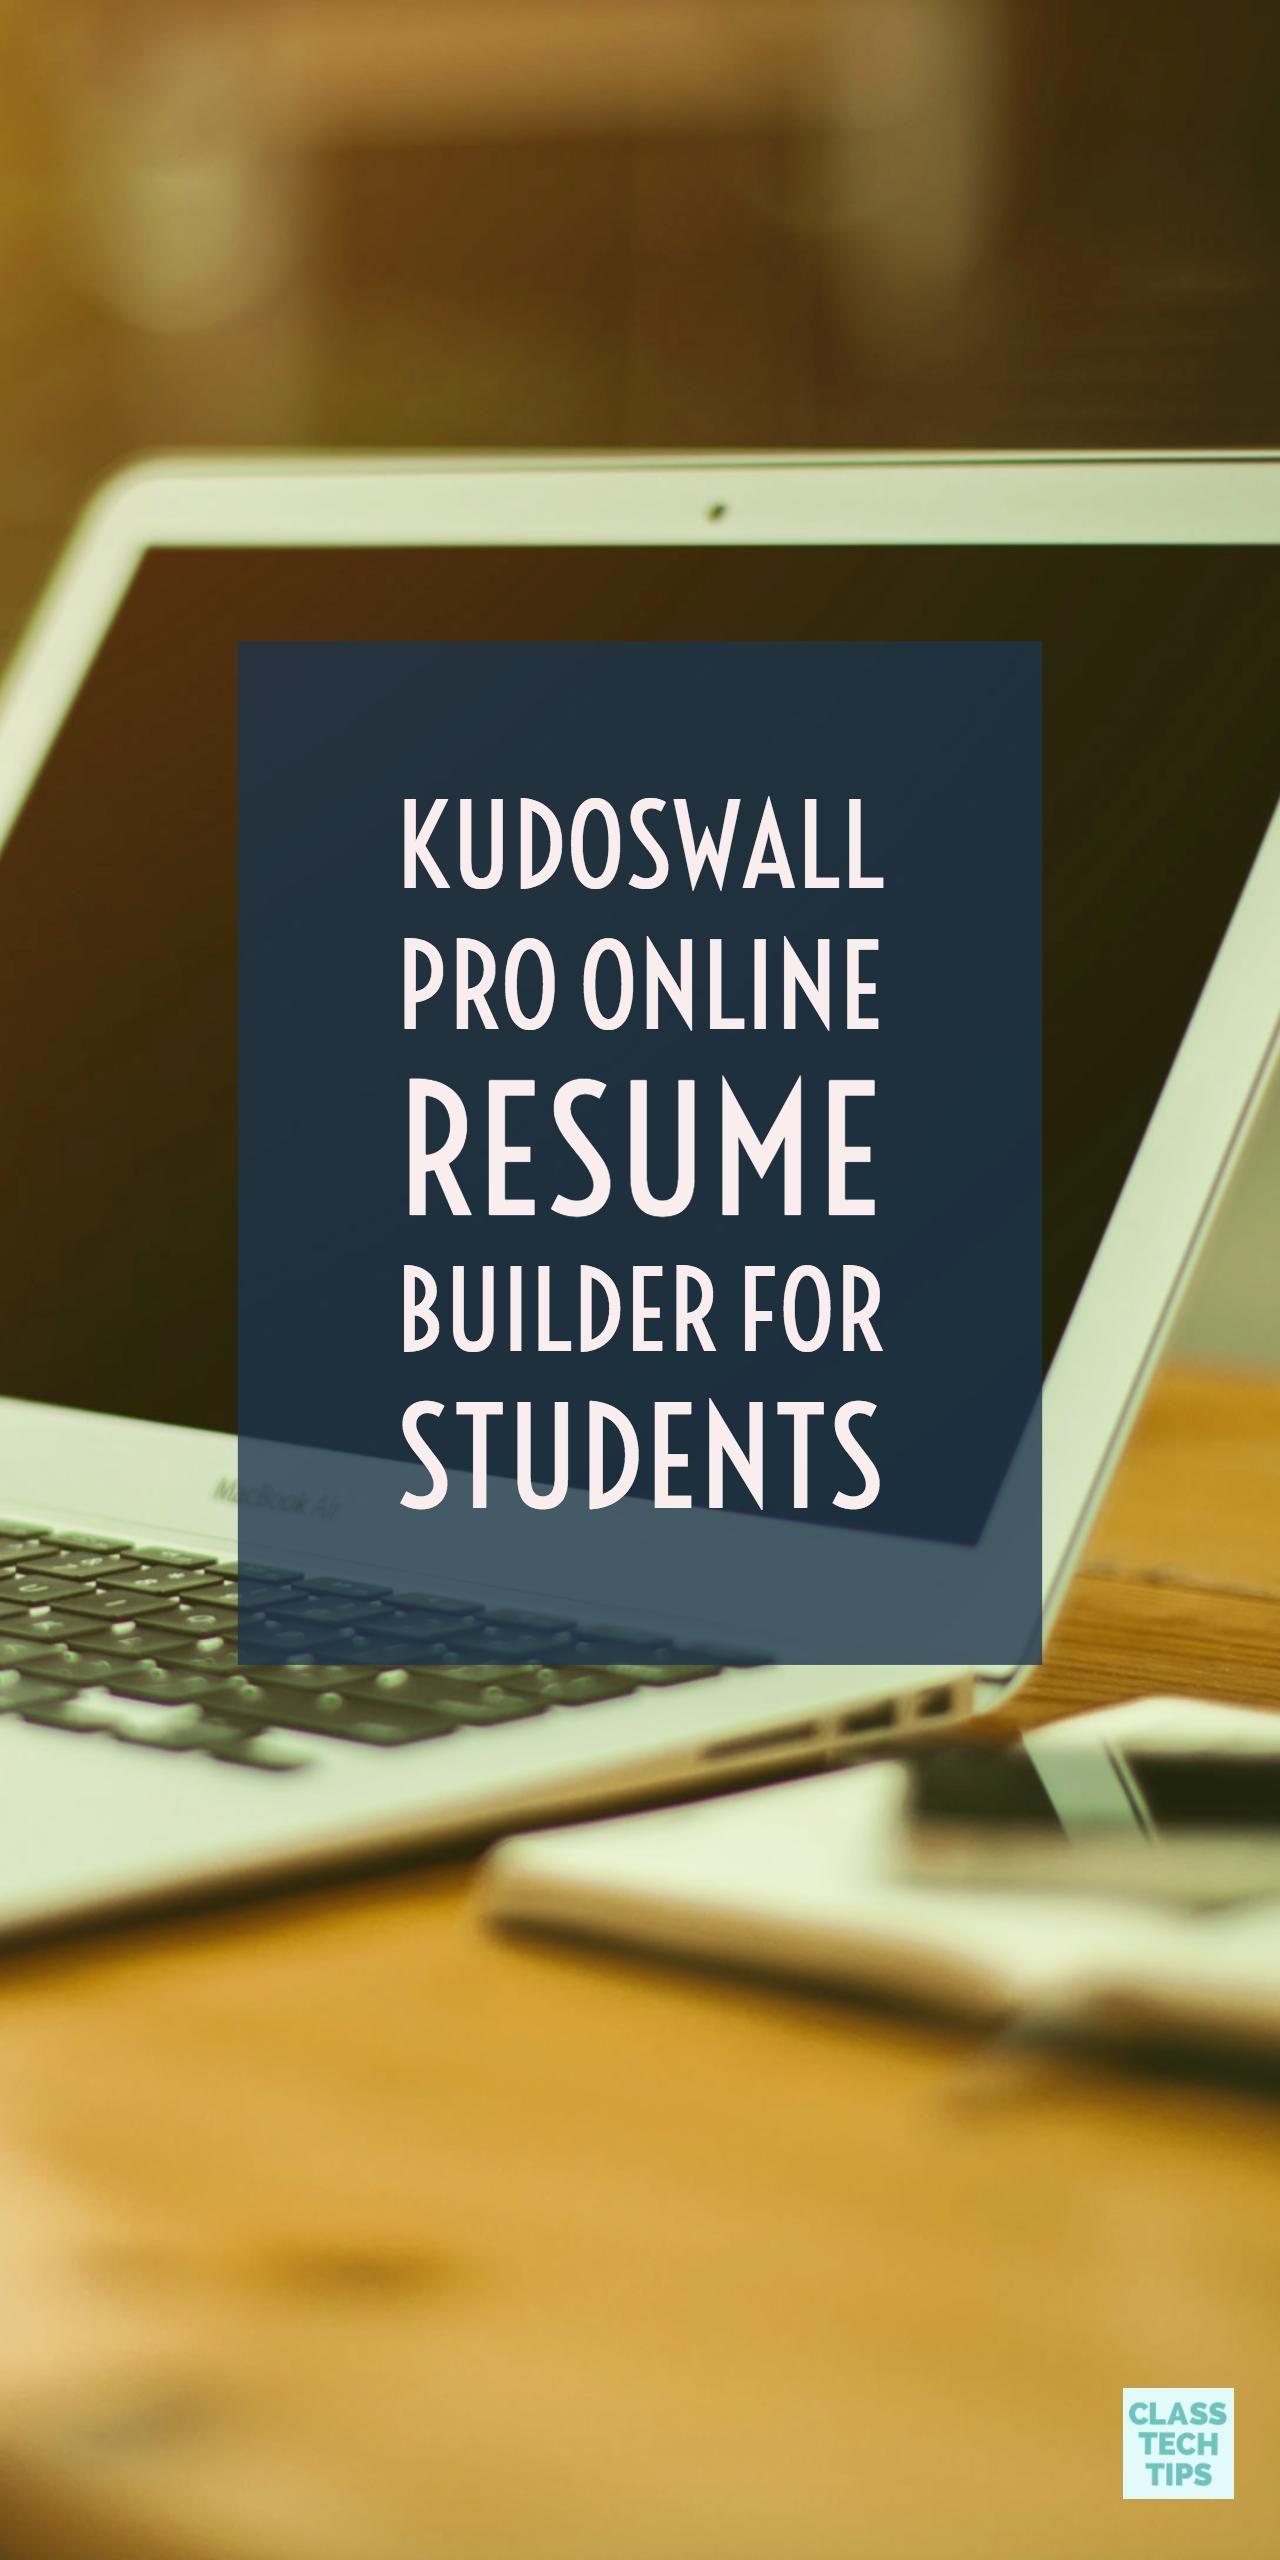 Kudoswall pro online resume builder for students online